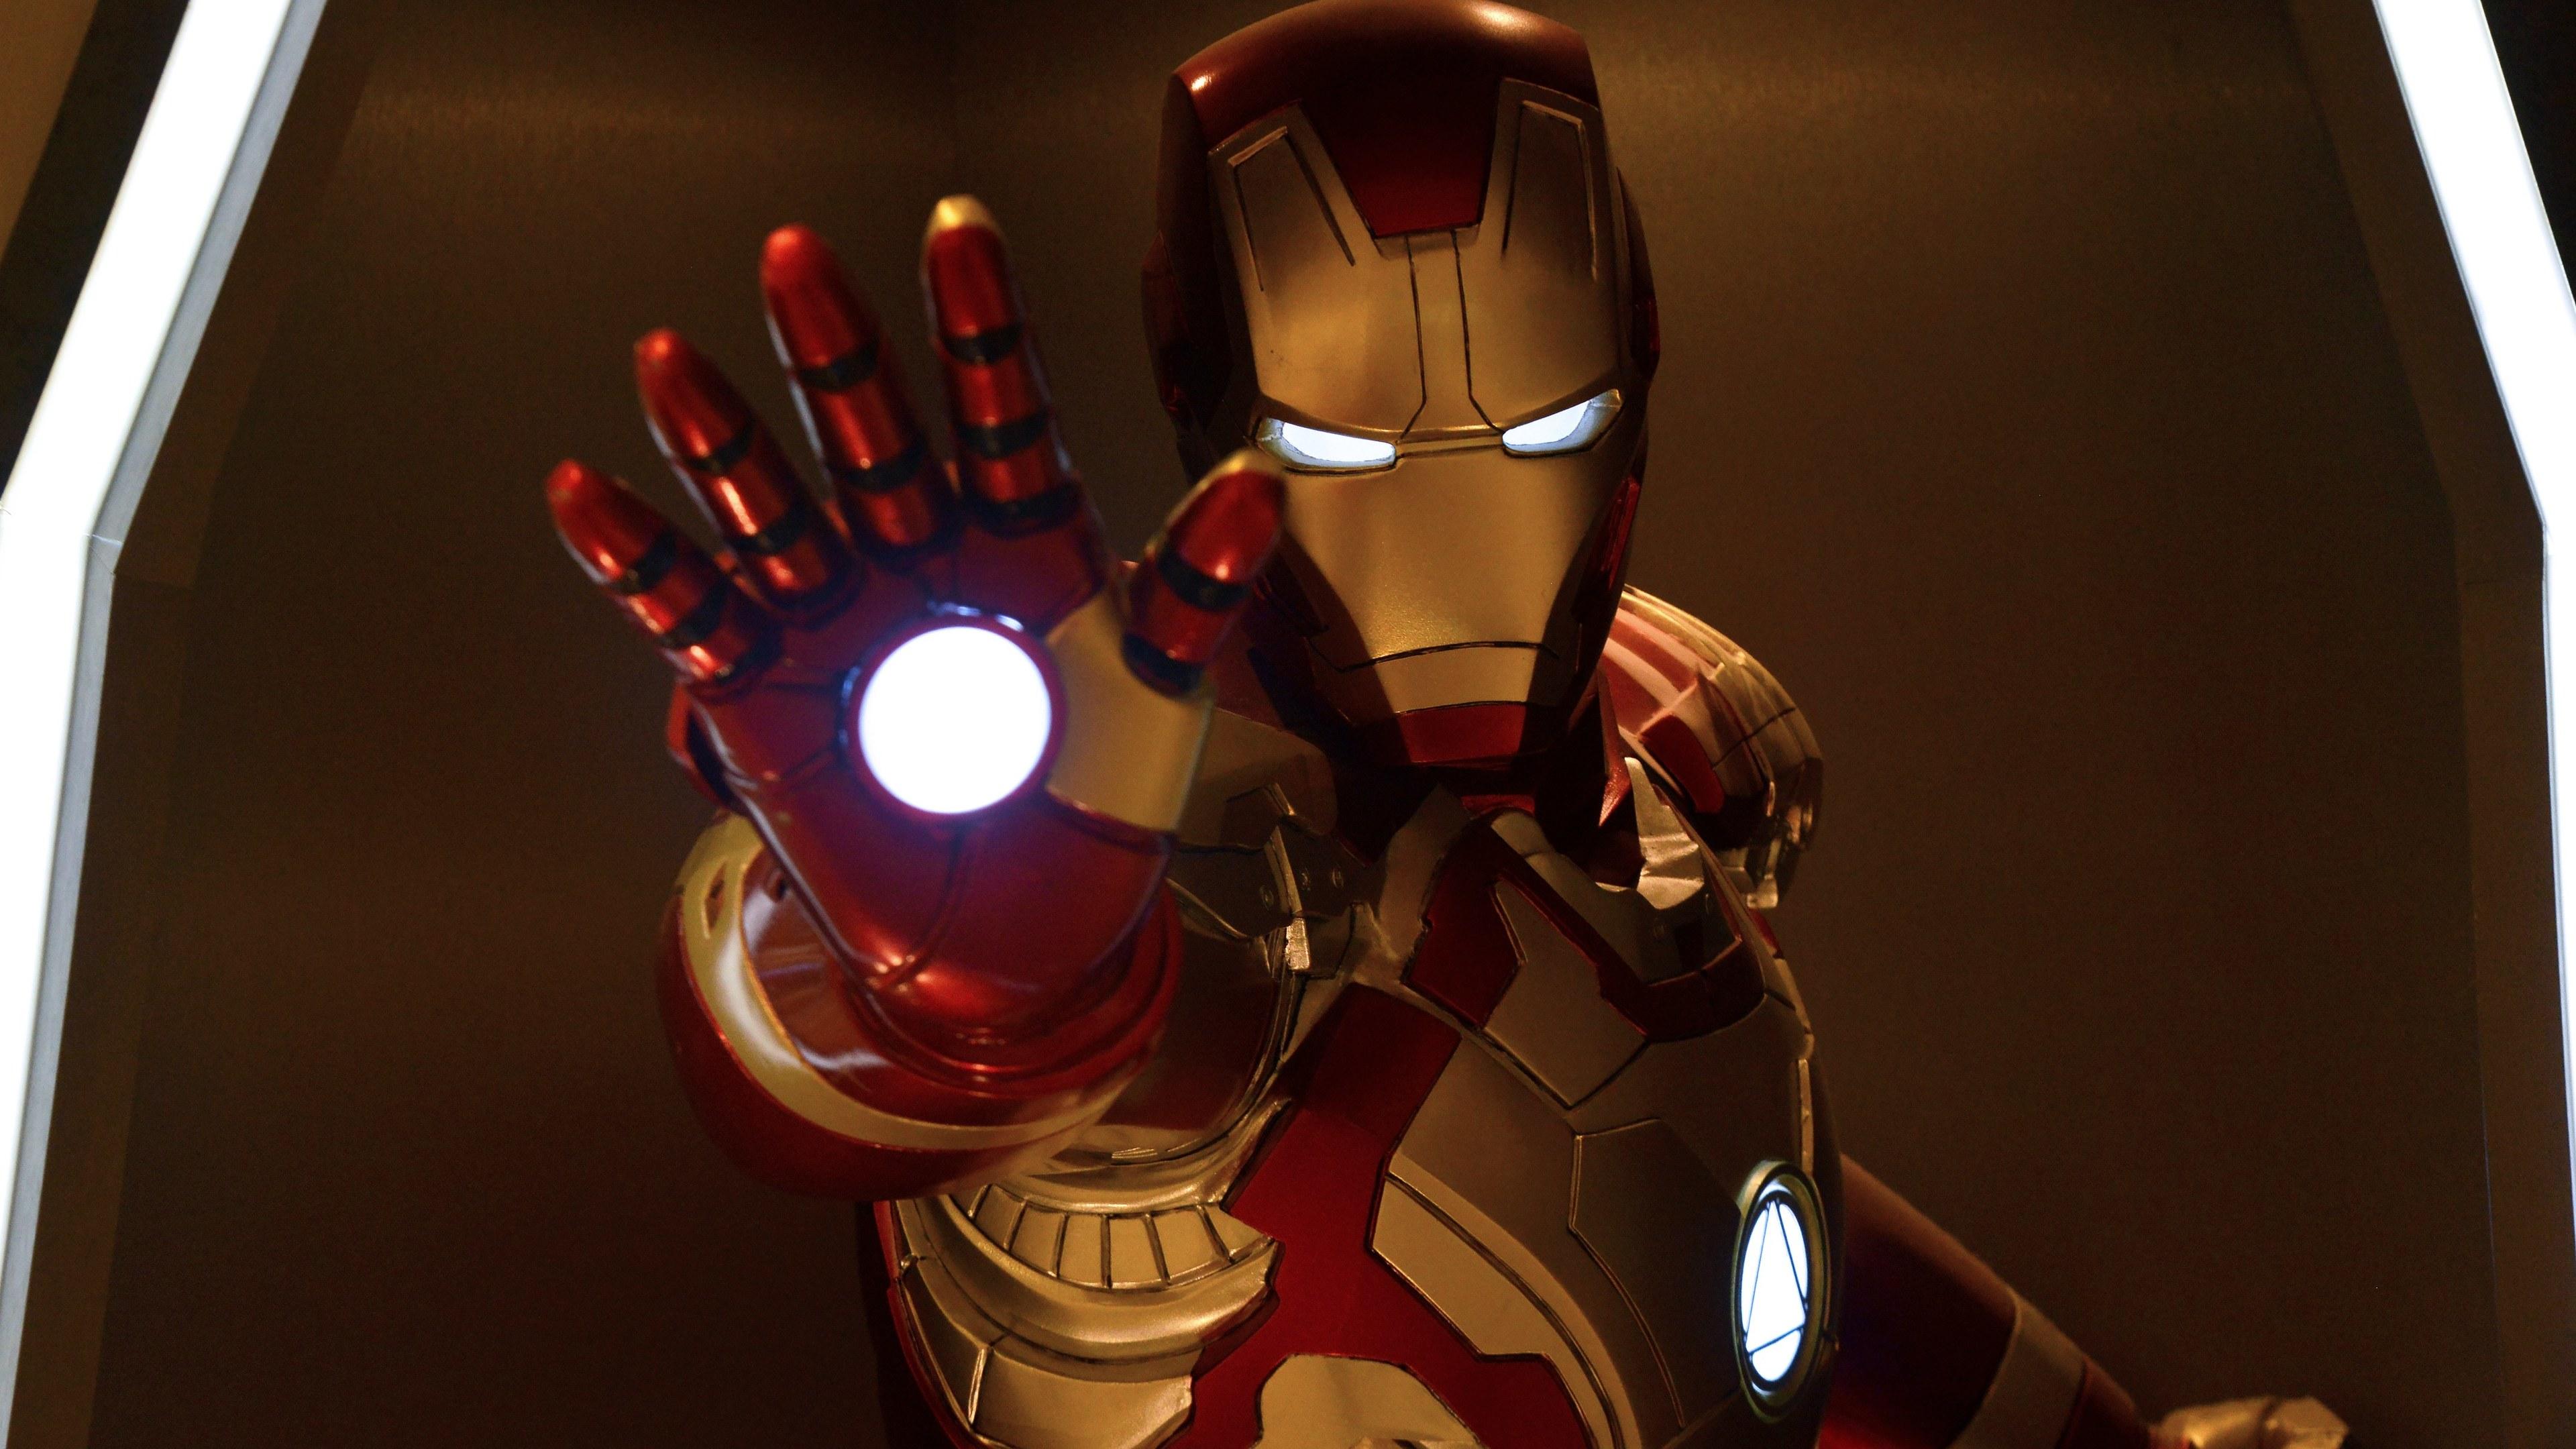 iron man 4k new 1553071907 - Iron Man 4k New - superheroes wallpapers, iron man wallpapers, hd-wallpapers, digital art wallpapers, artwork wallpapers, 4k-wallpapers